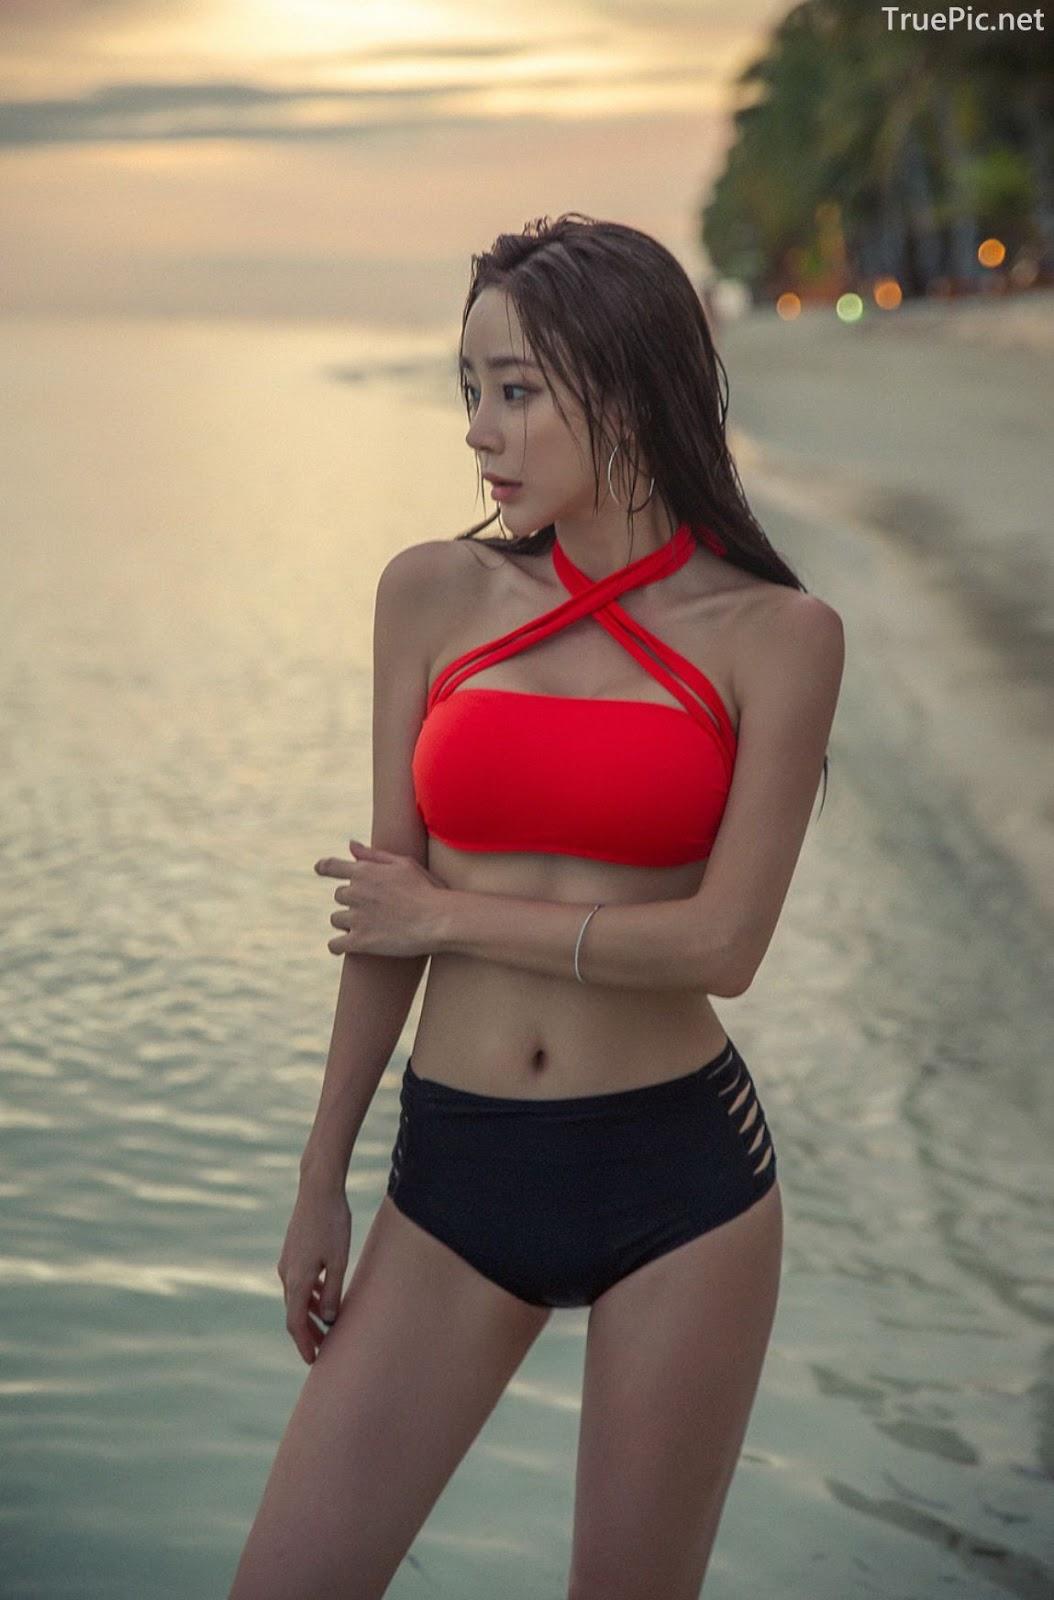 Hyun Kyung - Glam Chic Bikini - Korean model and fashion - Picture 4